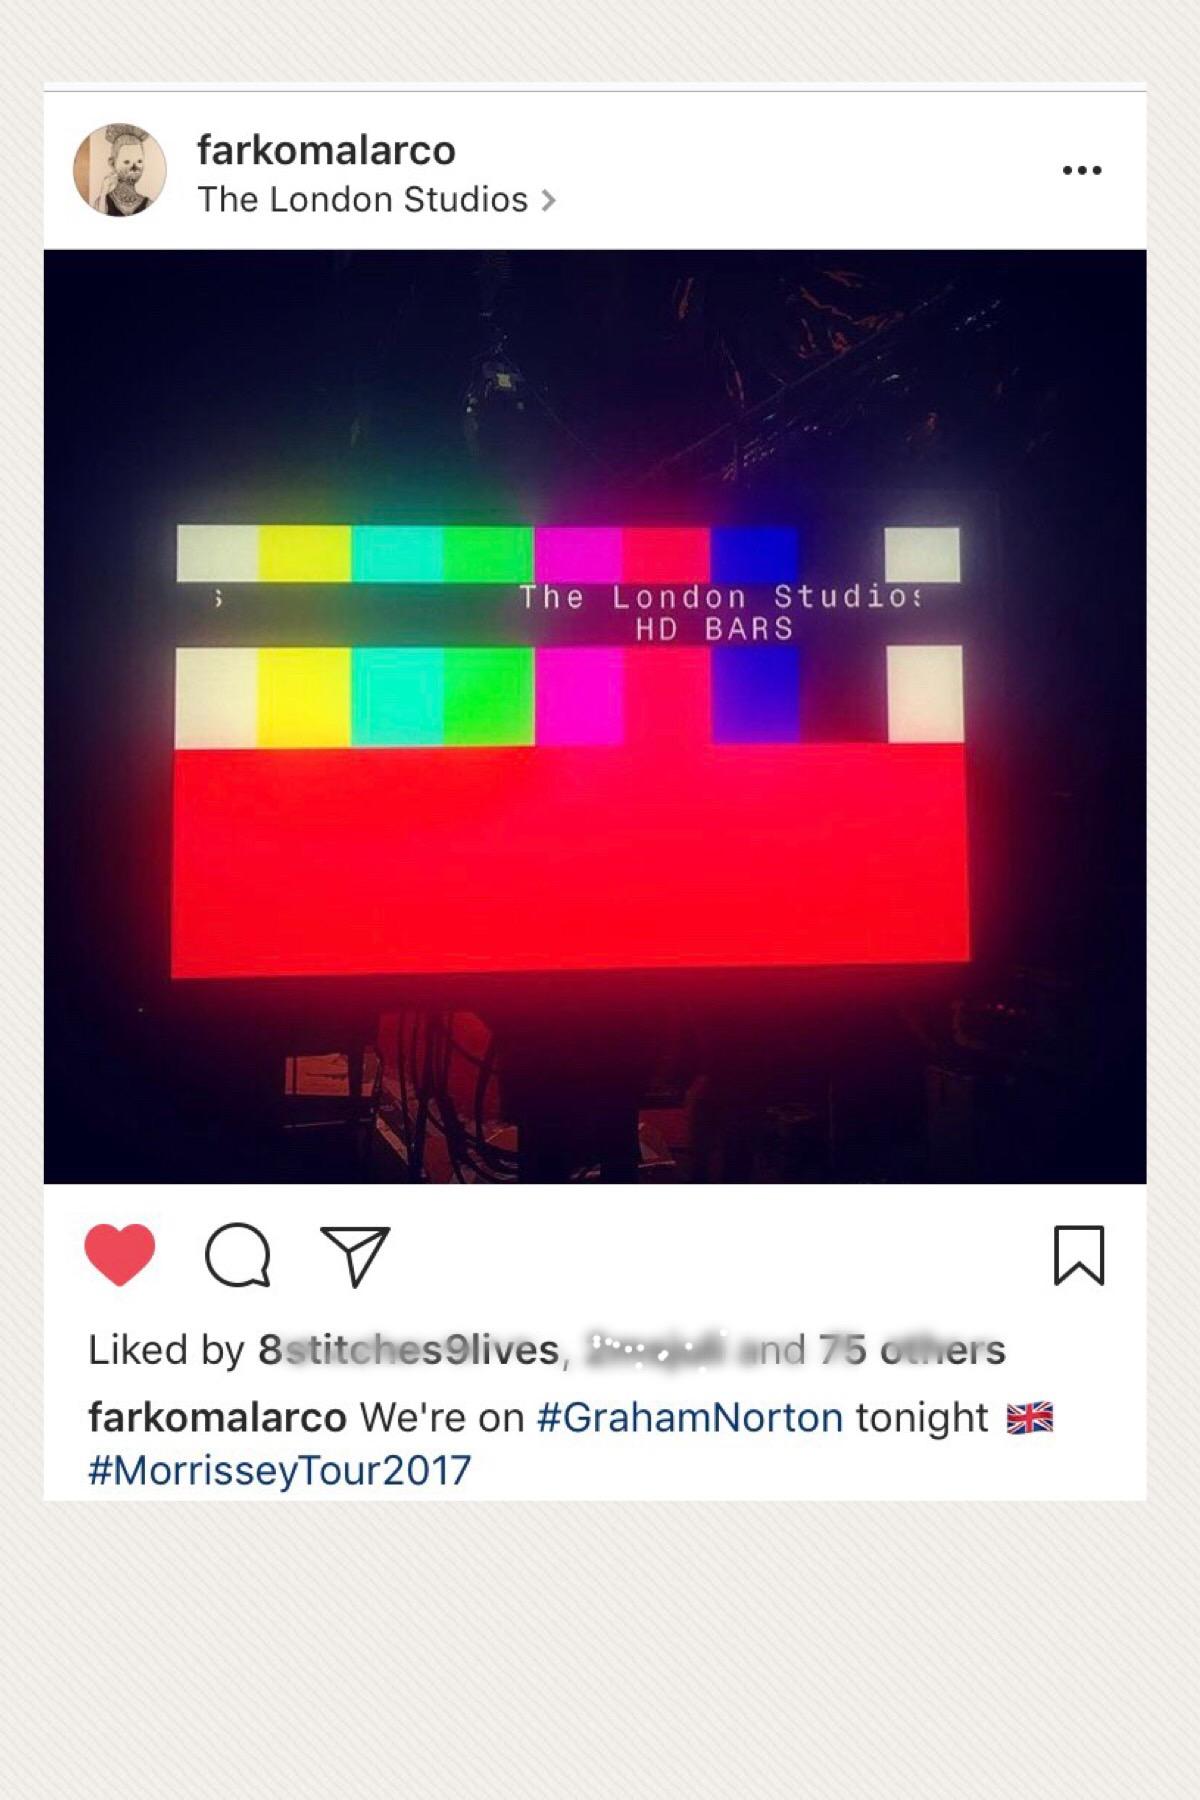 Morrissey on Graham Norton tonight - Mando Instagram (Oct  5, 2017